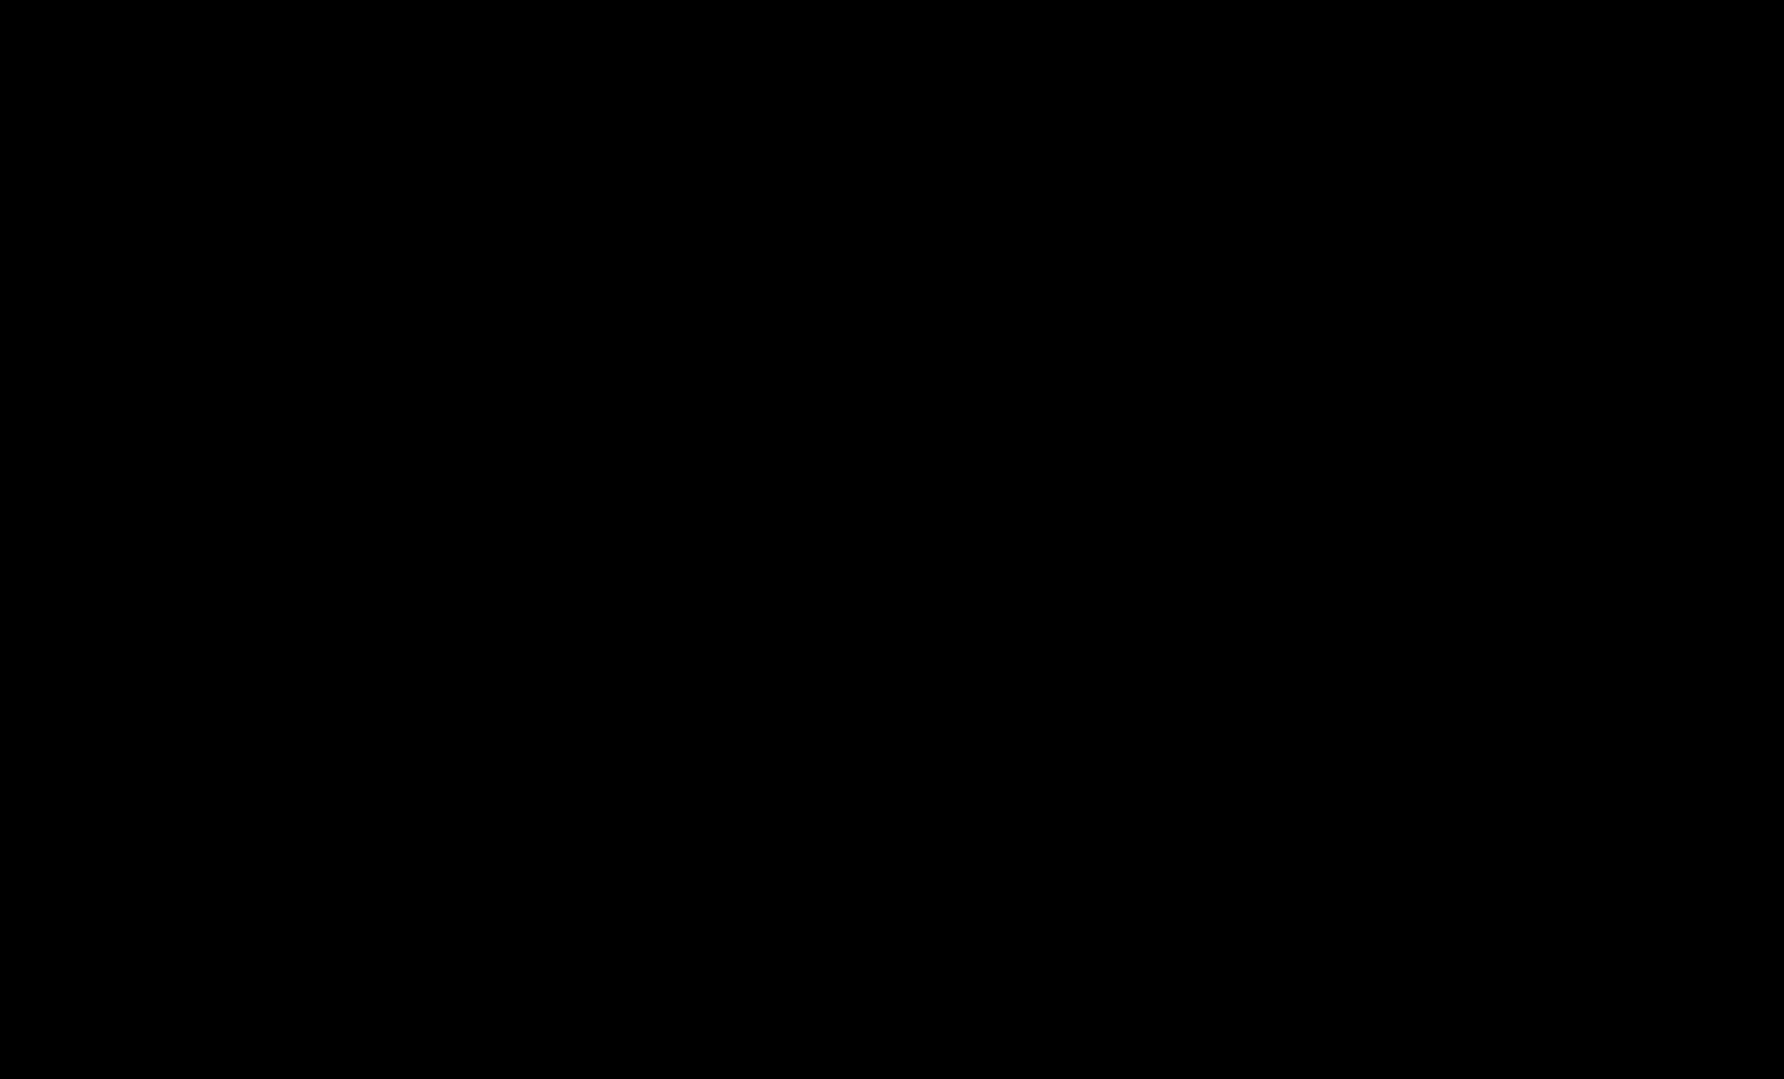 2-Aminodecanoic acid